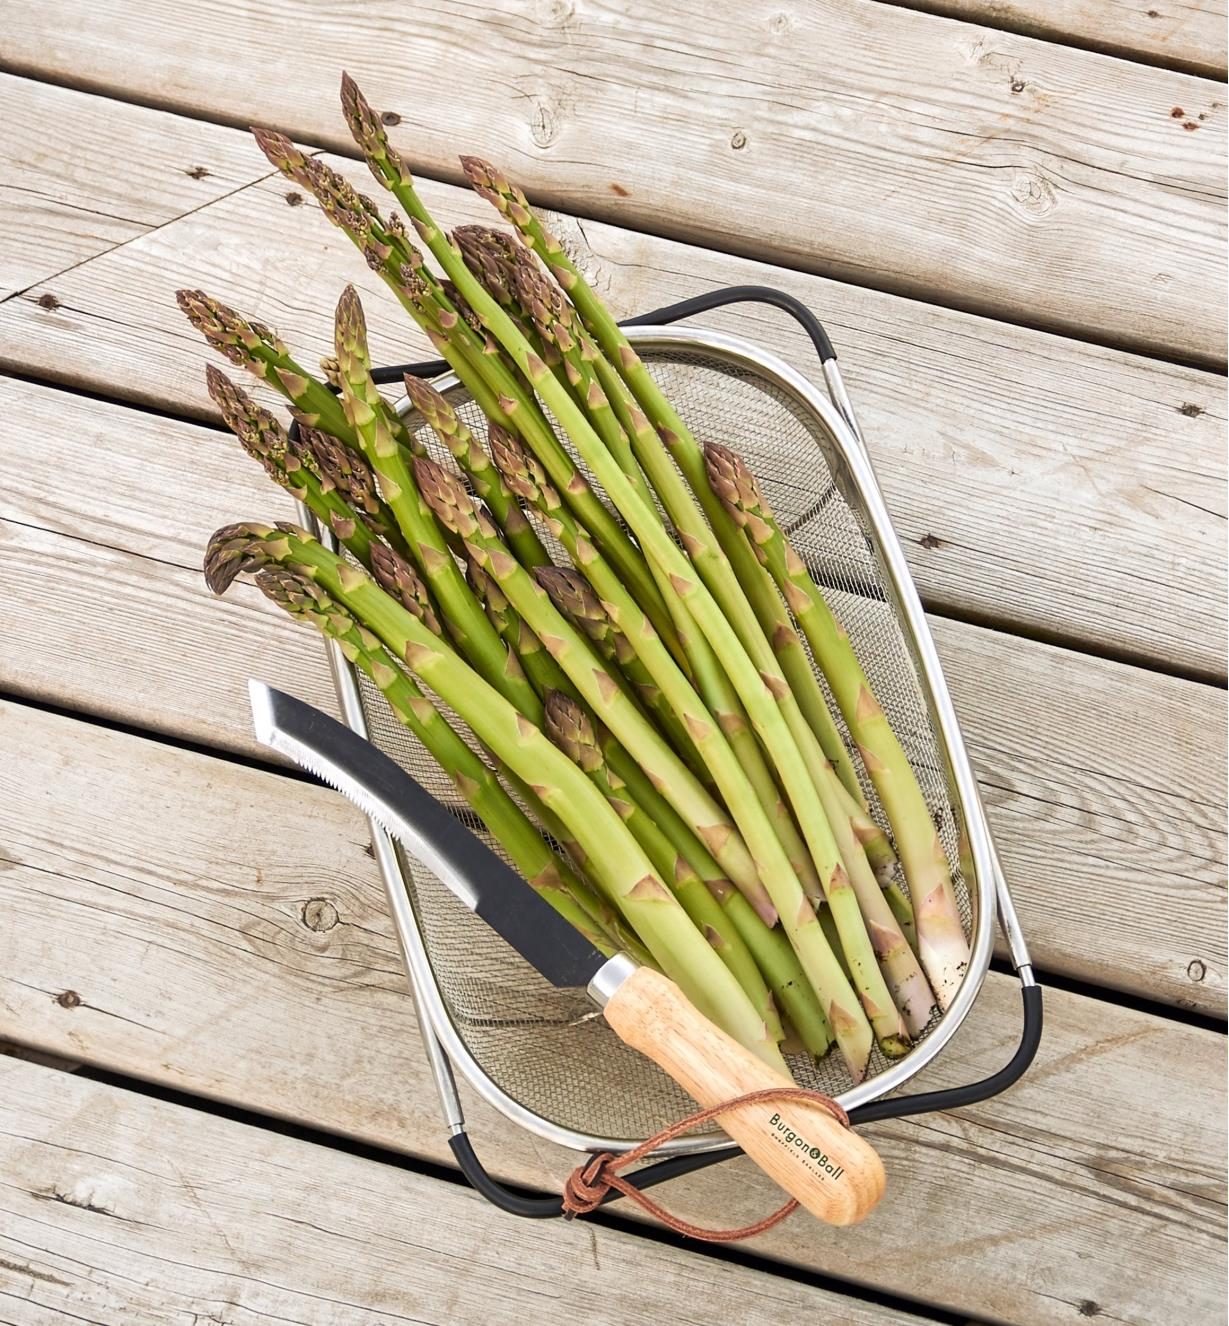 BL114 - Asparagus/Harvest Knife